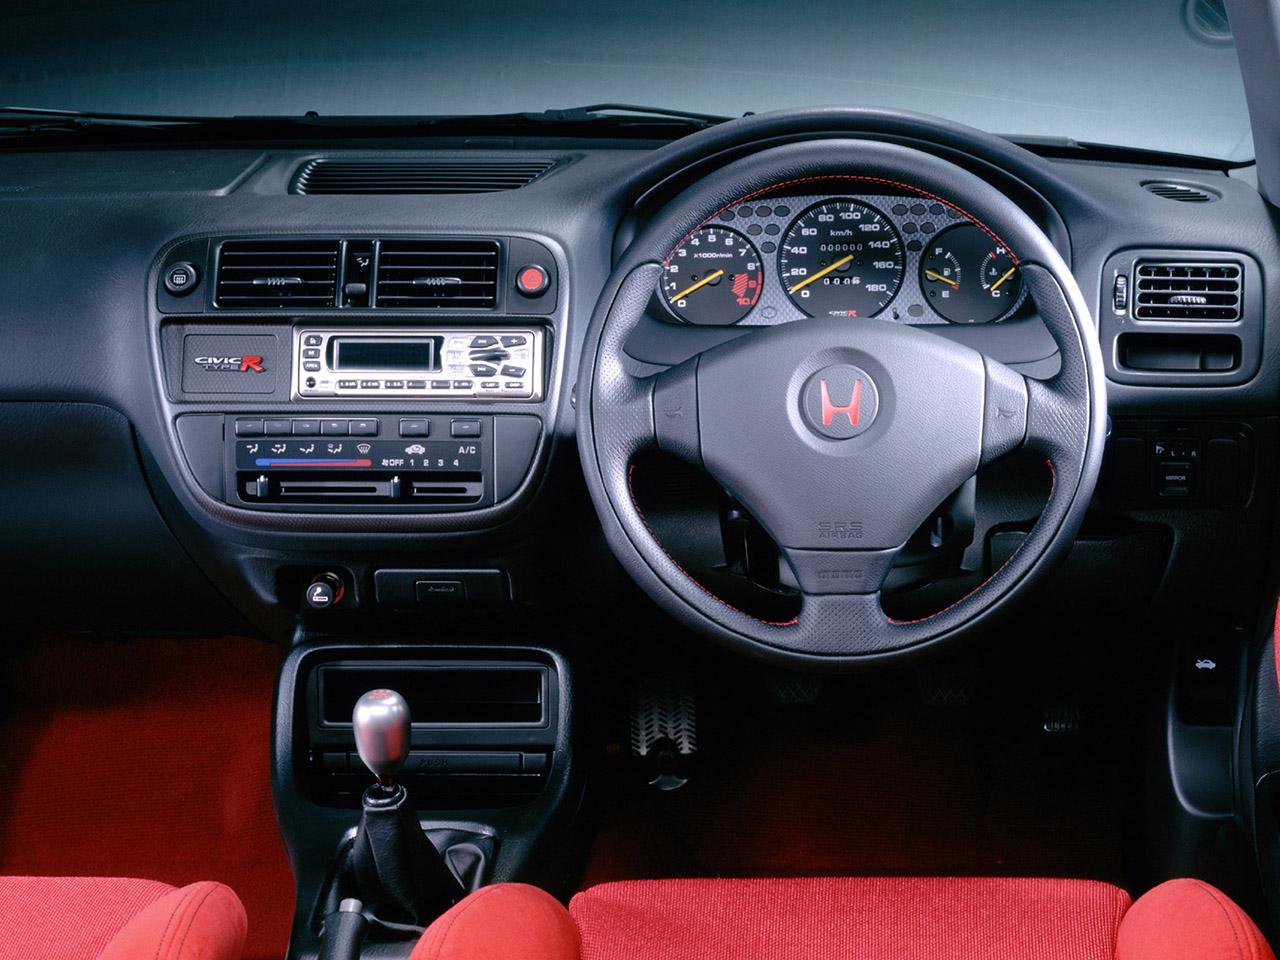 3dtuning Of Honda Civic Type R 3 Door 1997 Unique On Line Car Configurator For